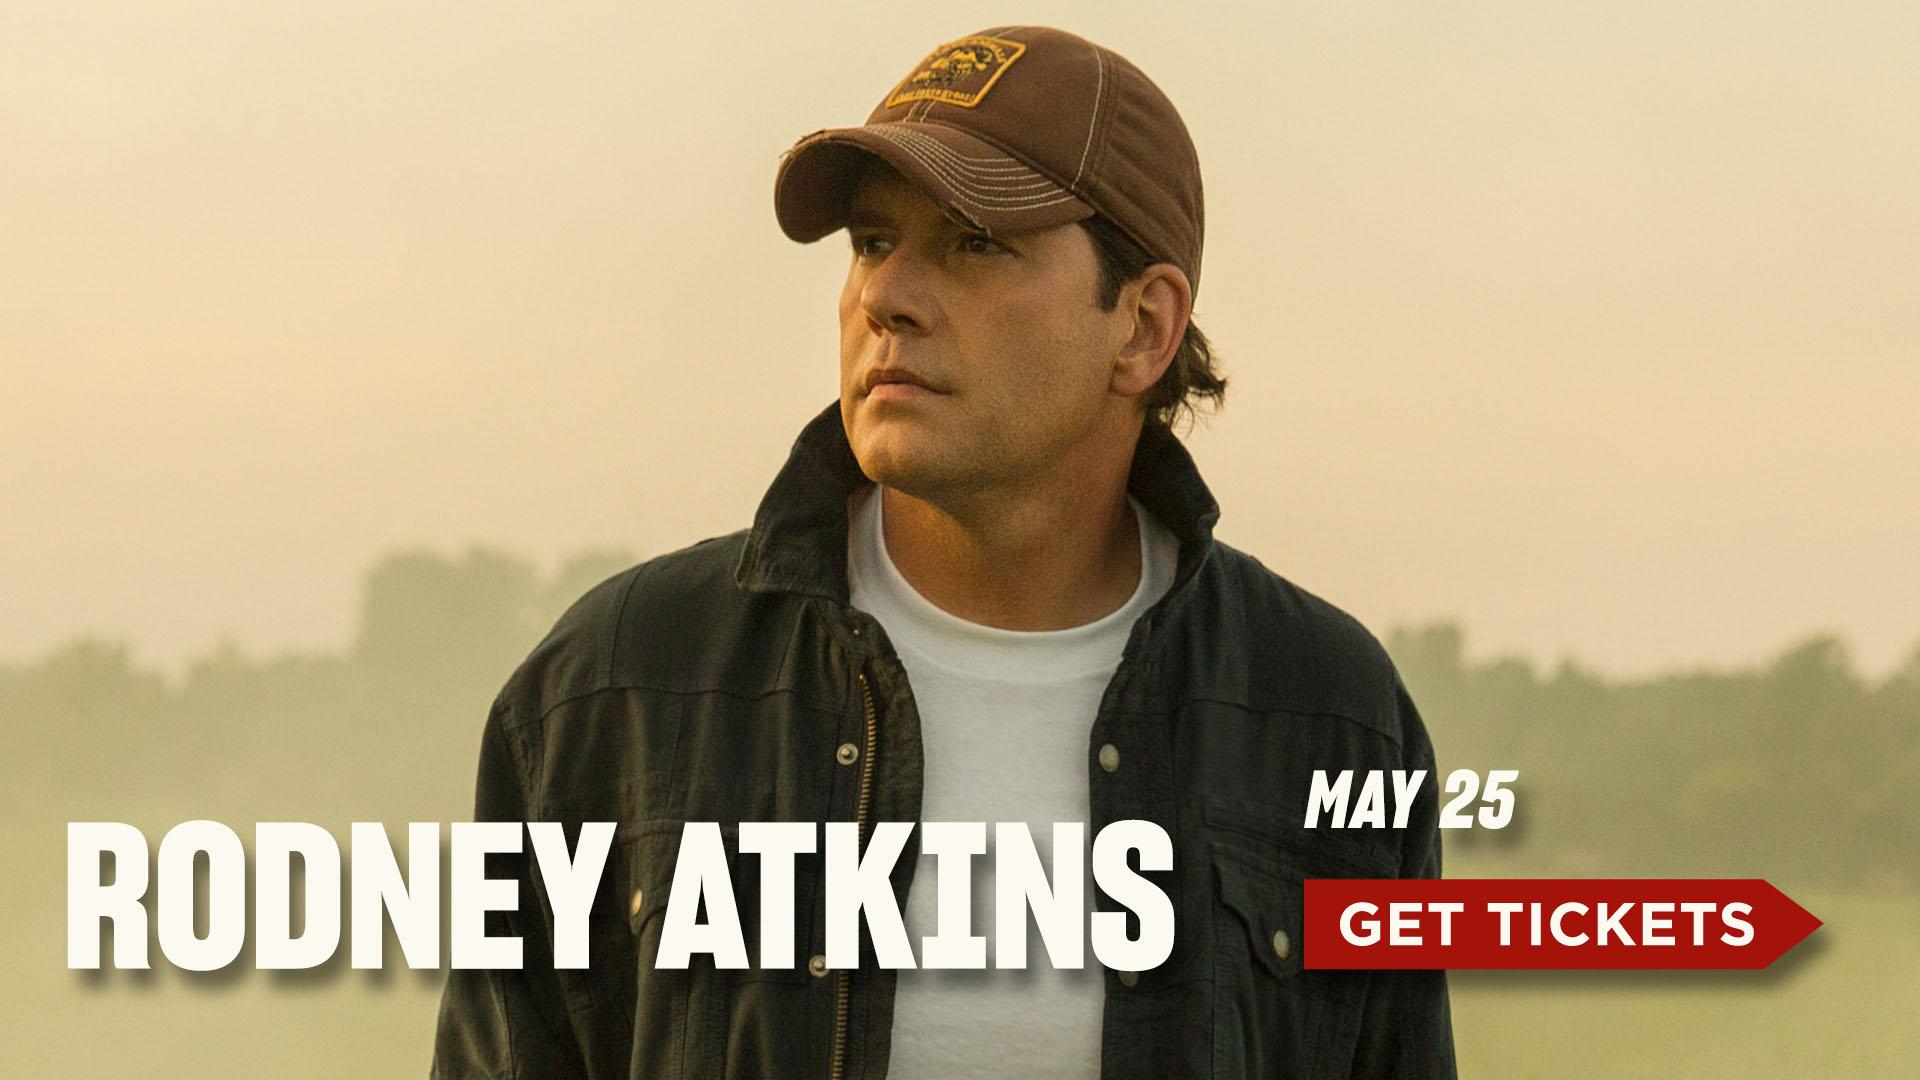 Rodney Atkins, May 25- Get Tickets